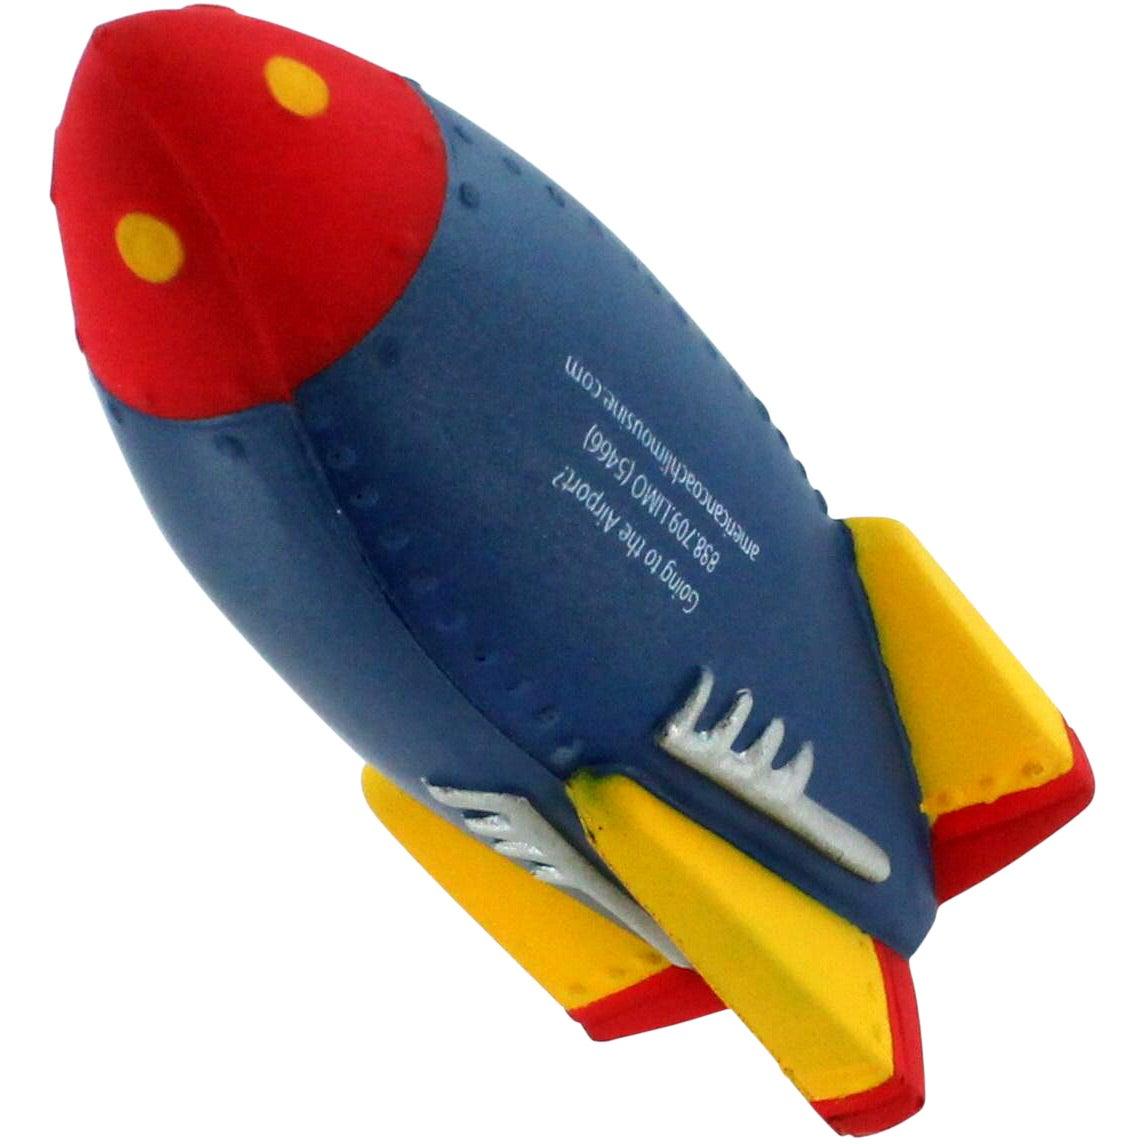 Rocketship Stress Reliever